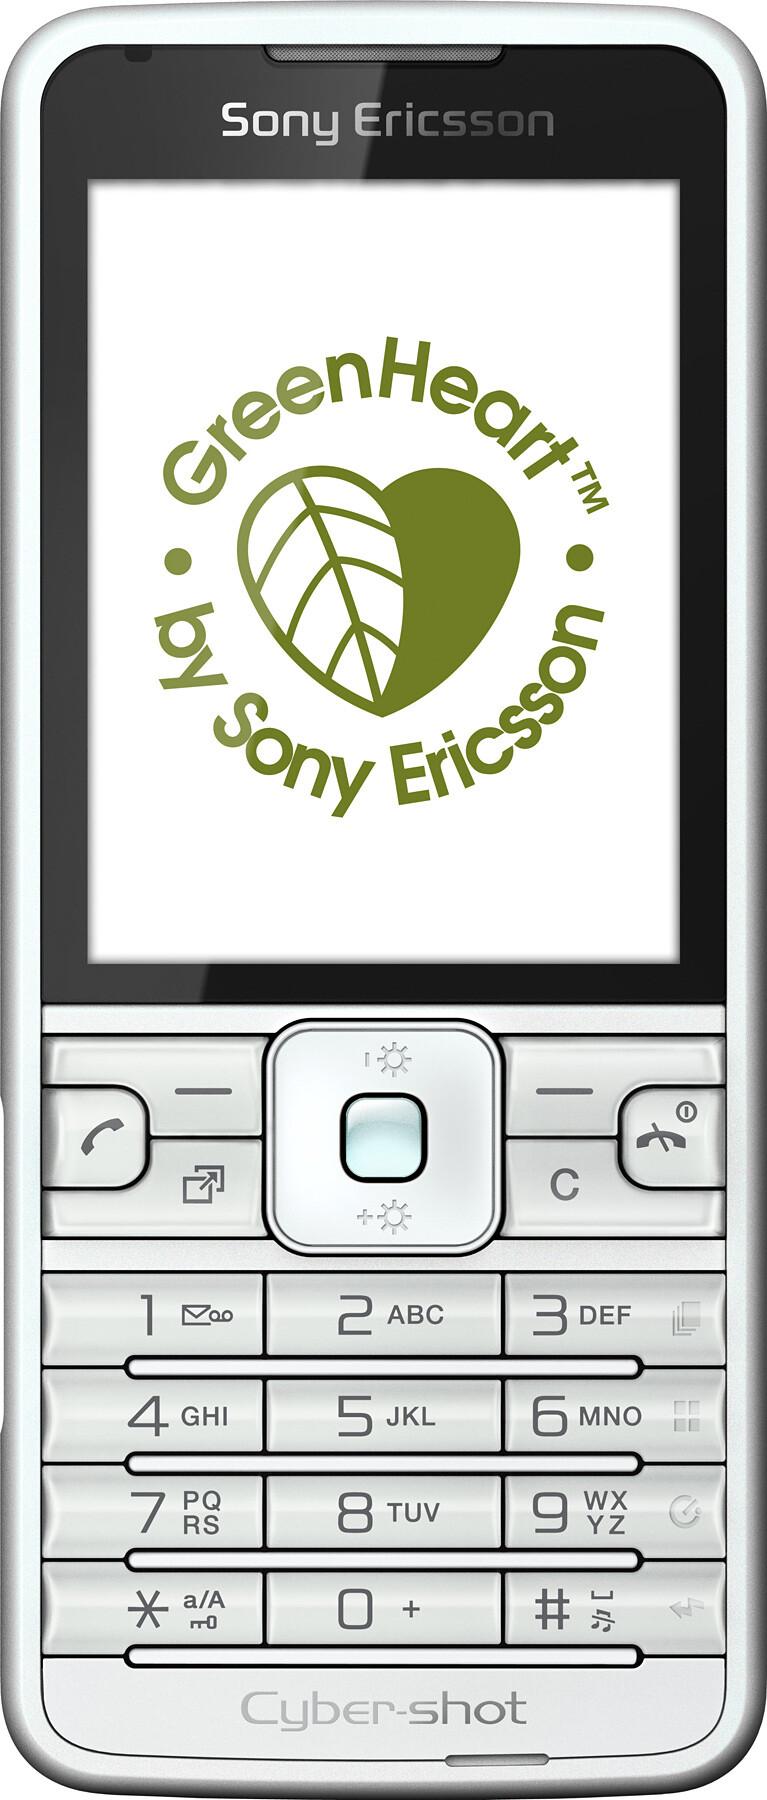 Sony Ericsson C901 GreenHeart